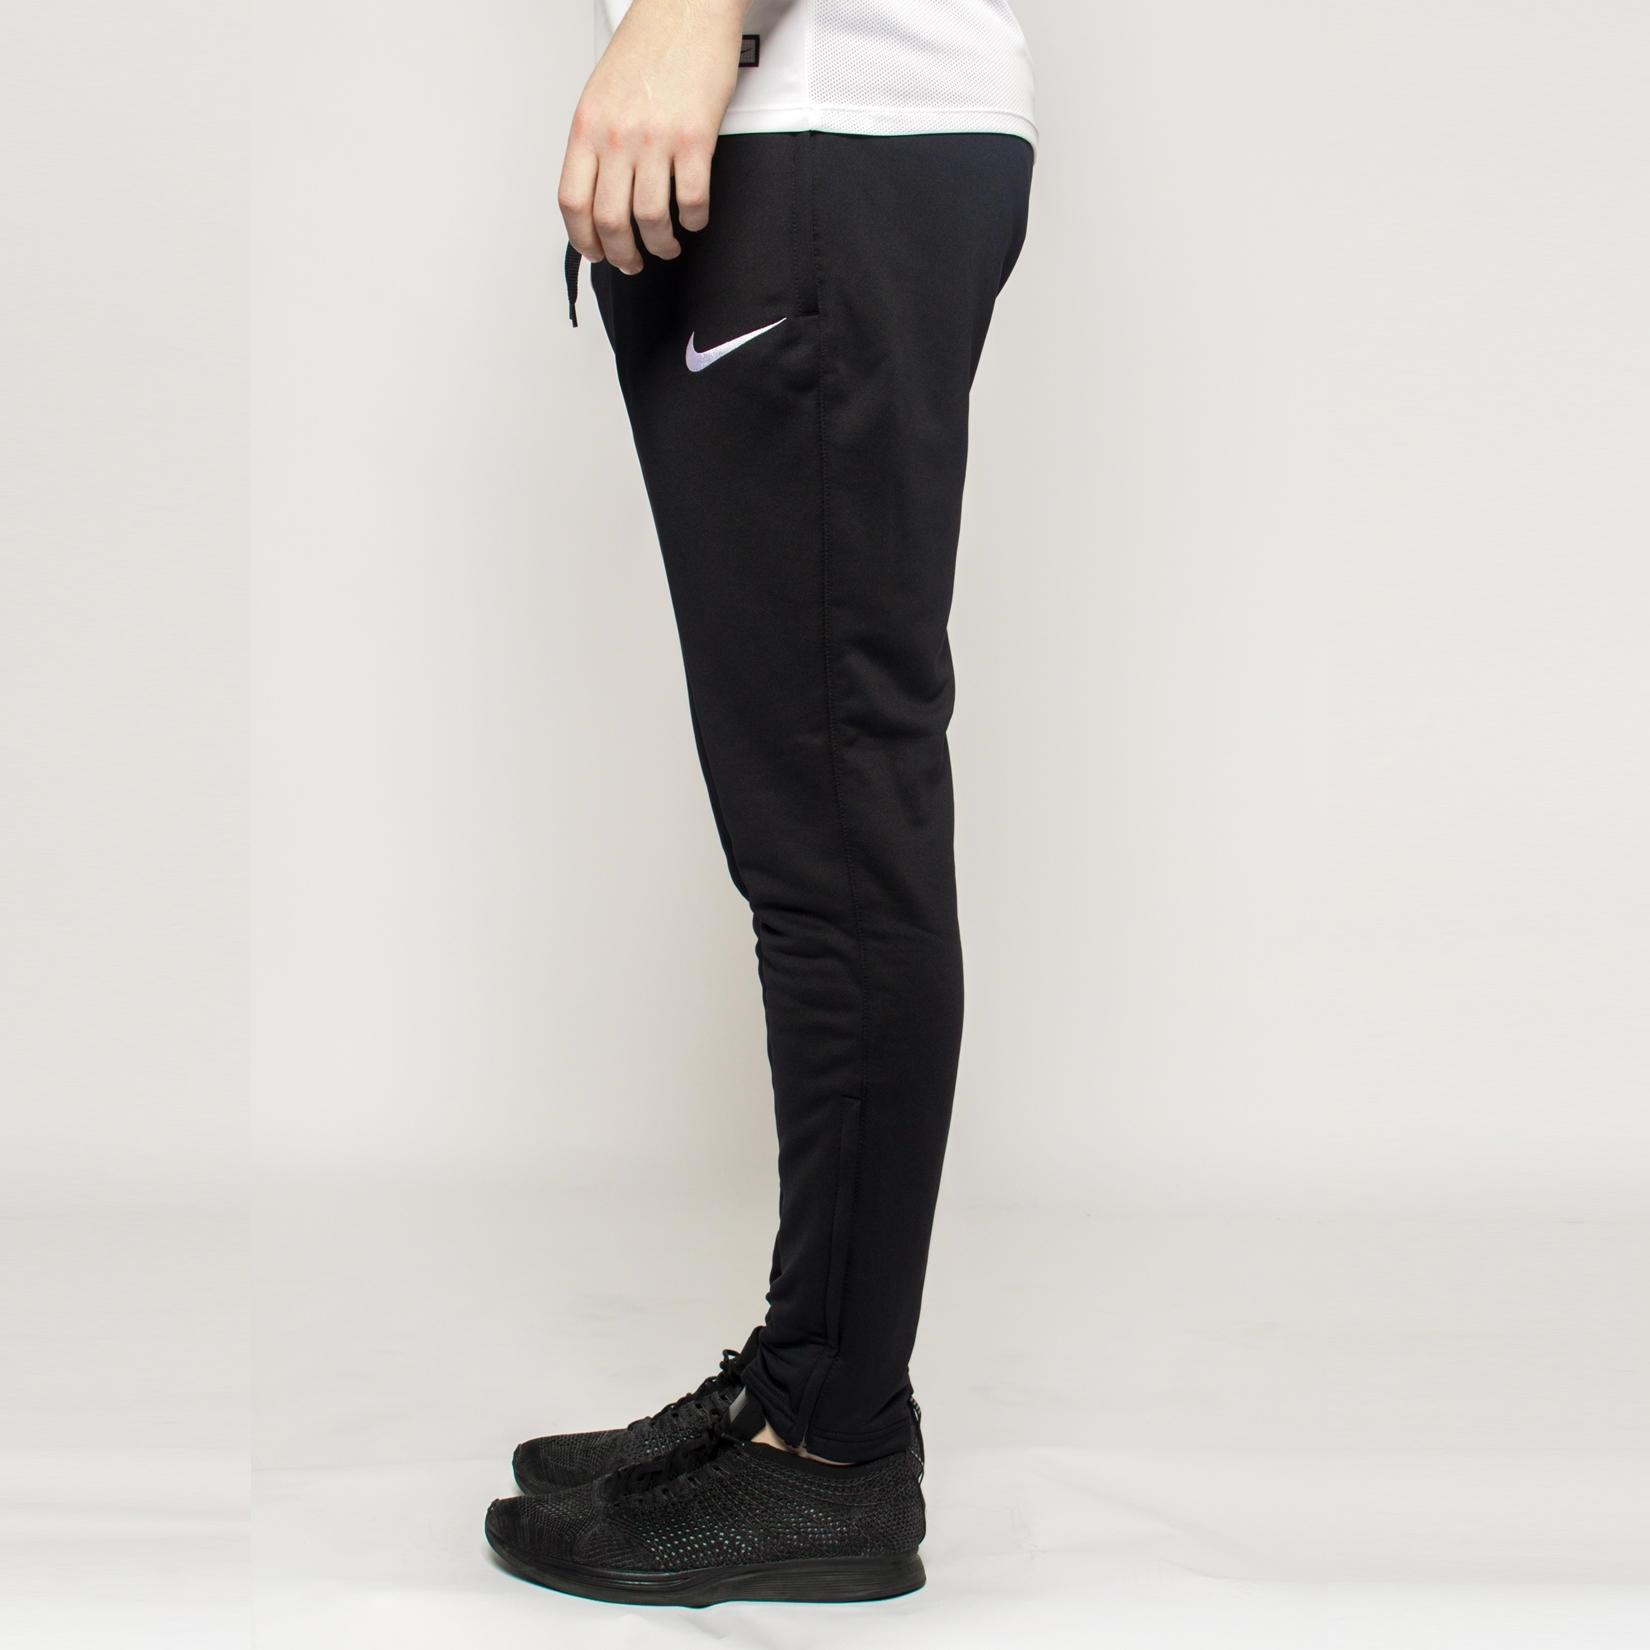 c69b209c Спортивные штаны Nike Academy 16 Tech Pant ZAF